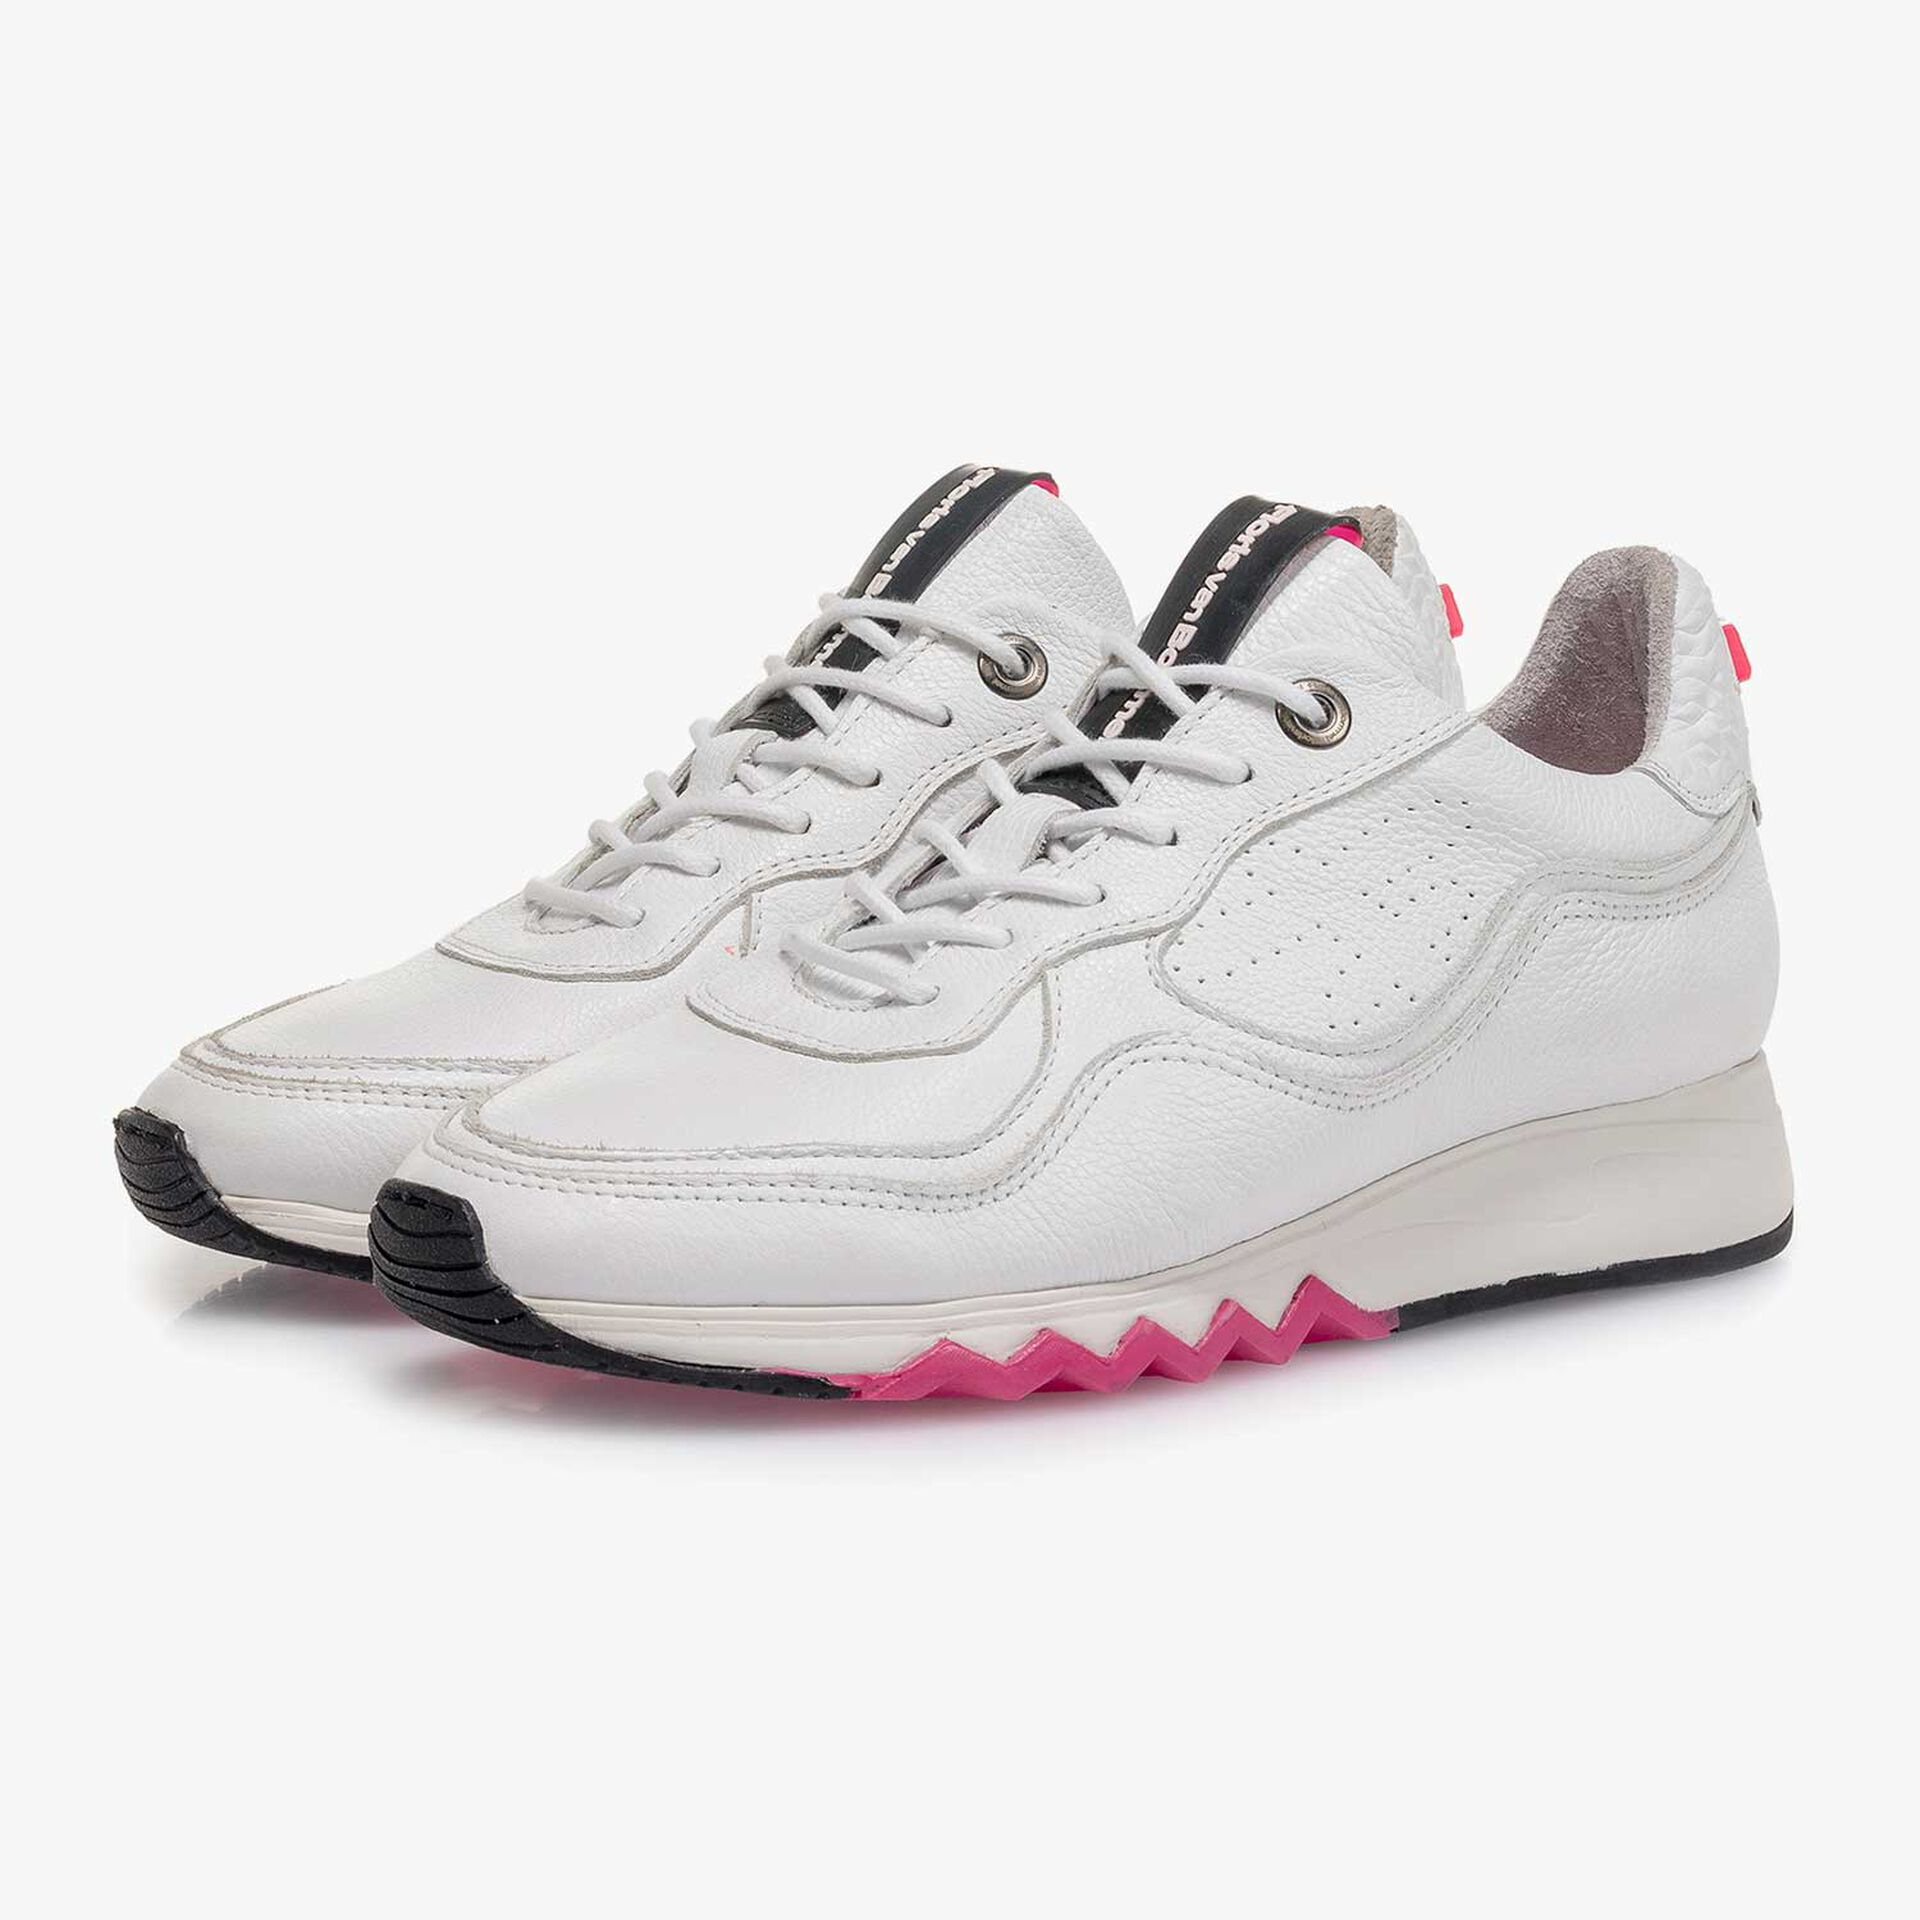 Weißer fein strukturierter Kalbsleder-Sneaker